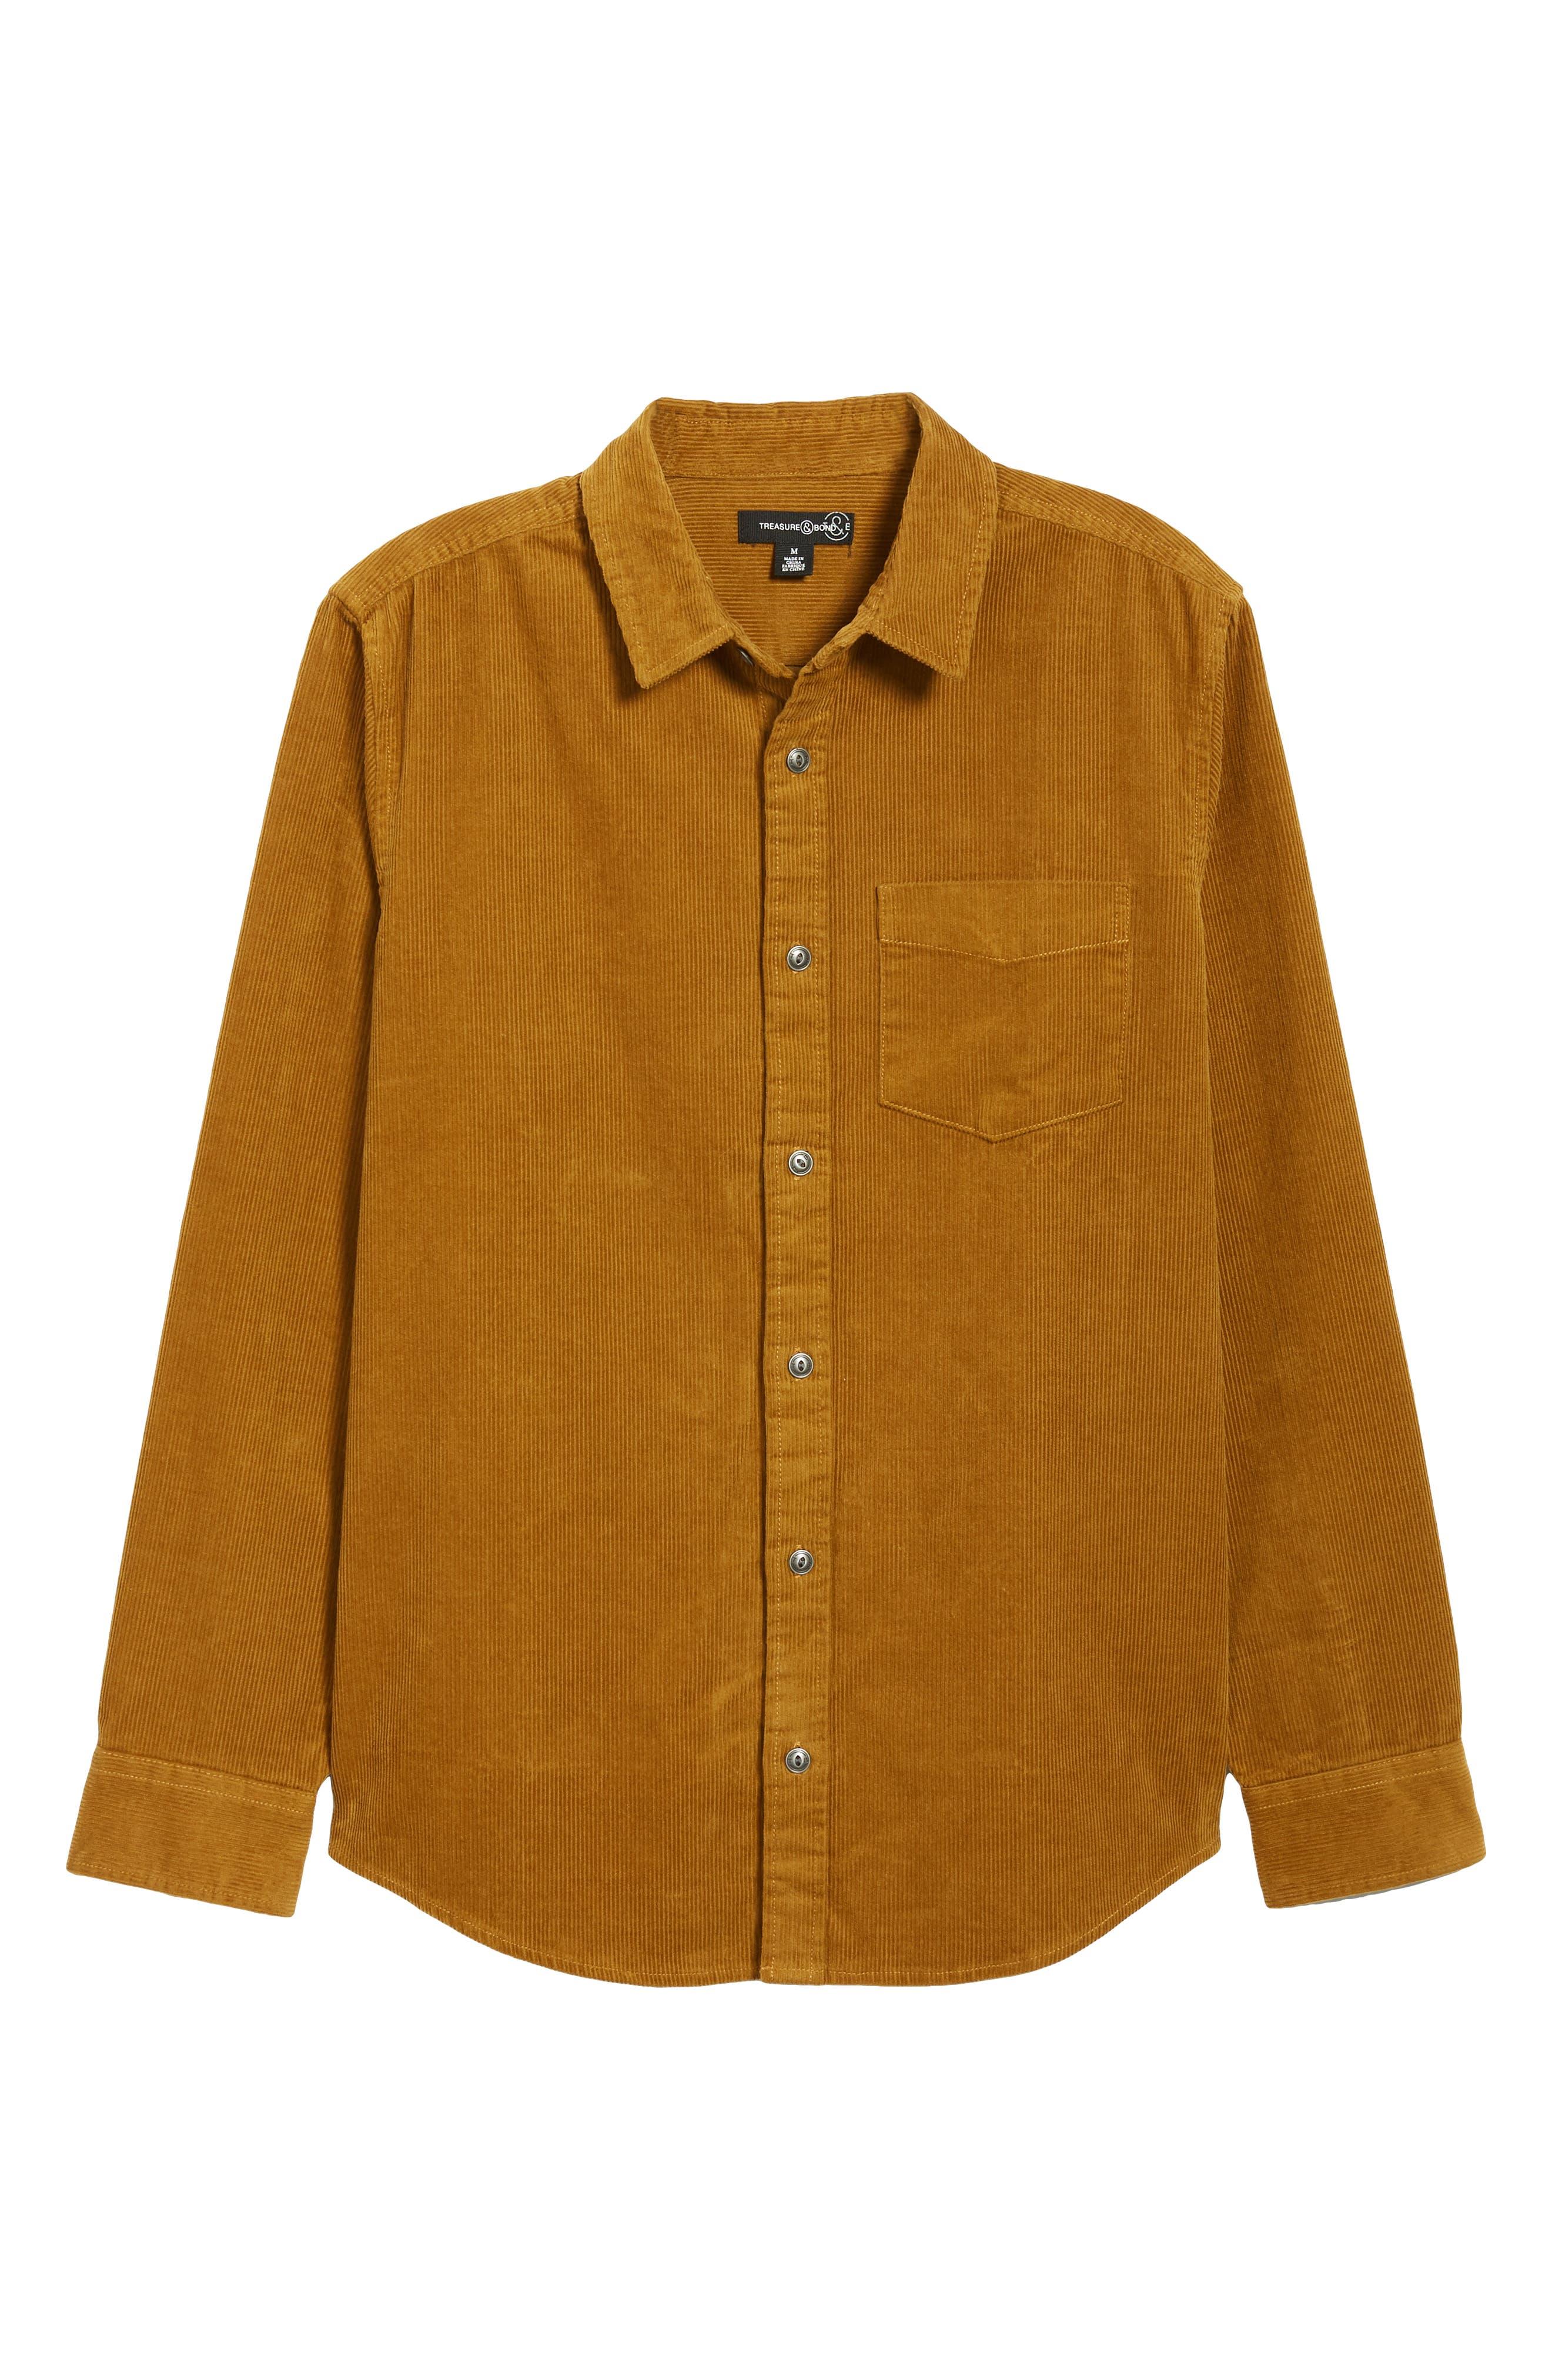 Regular Fit Corduroy Shirt Jacket,                             Alternate thumbnail 5, color,                             BROWN BRONZE